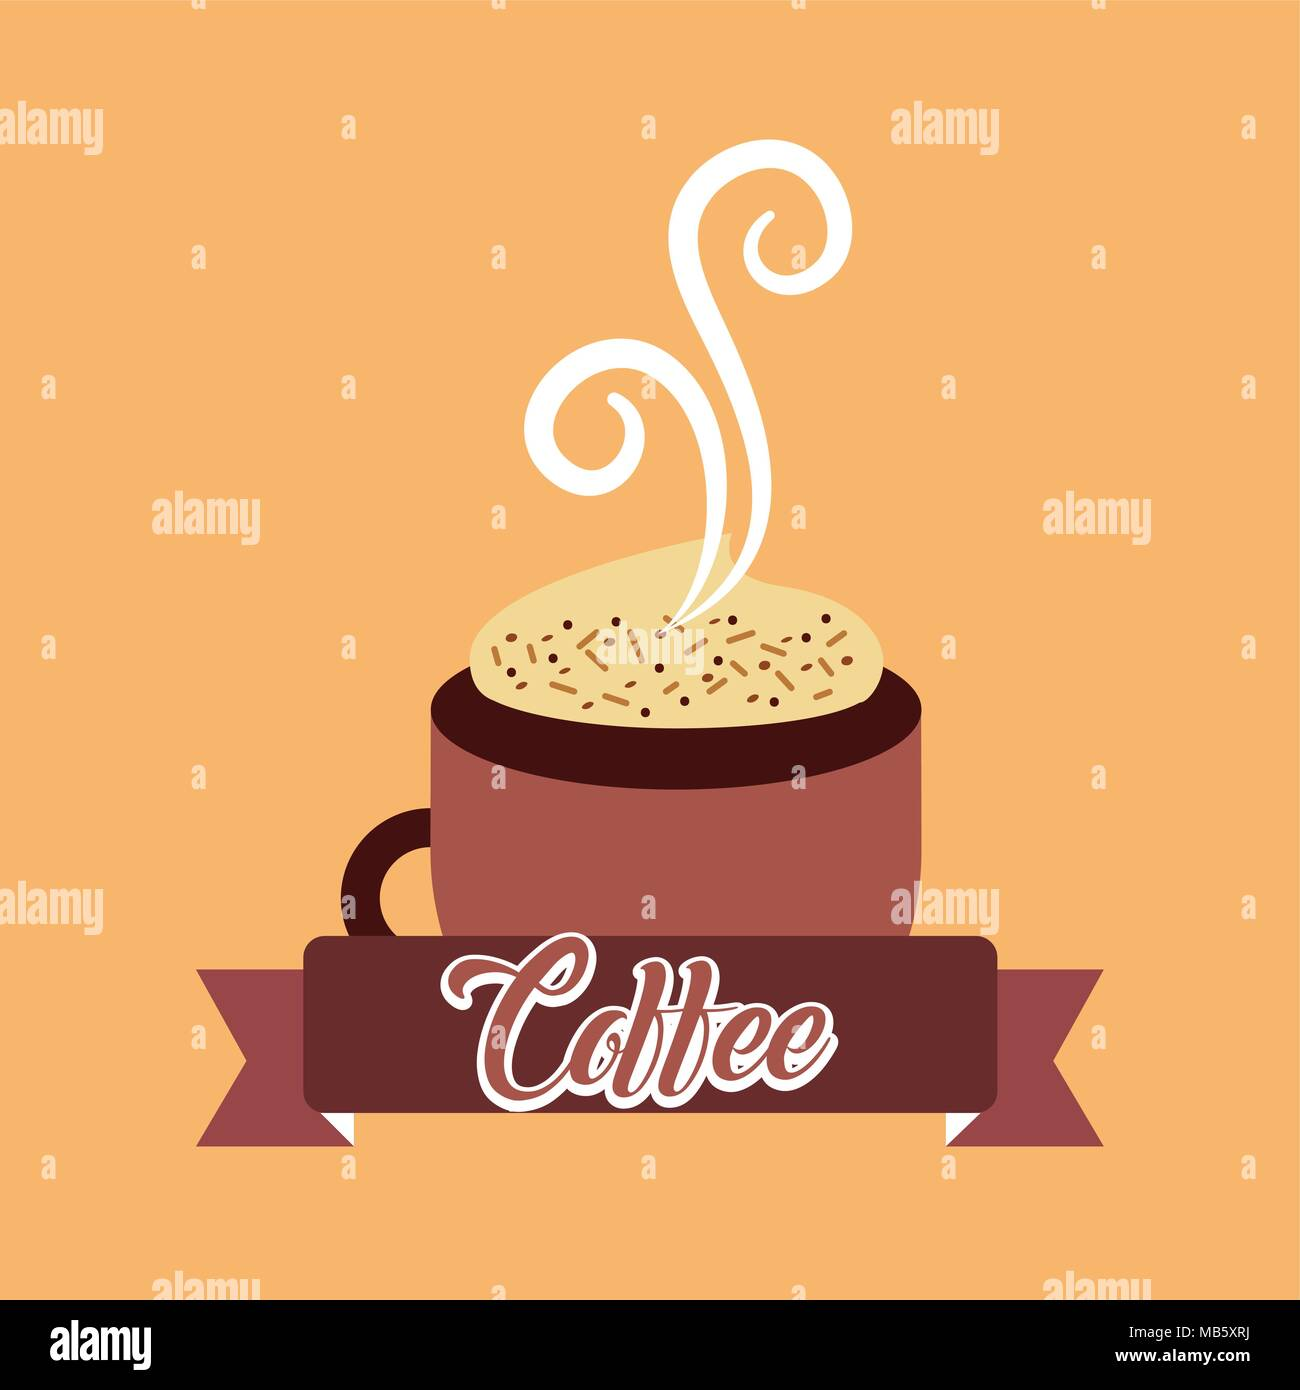 coffee time card - Stock Image